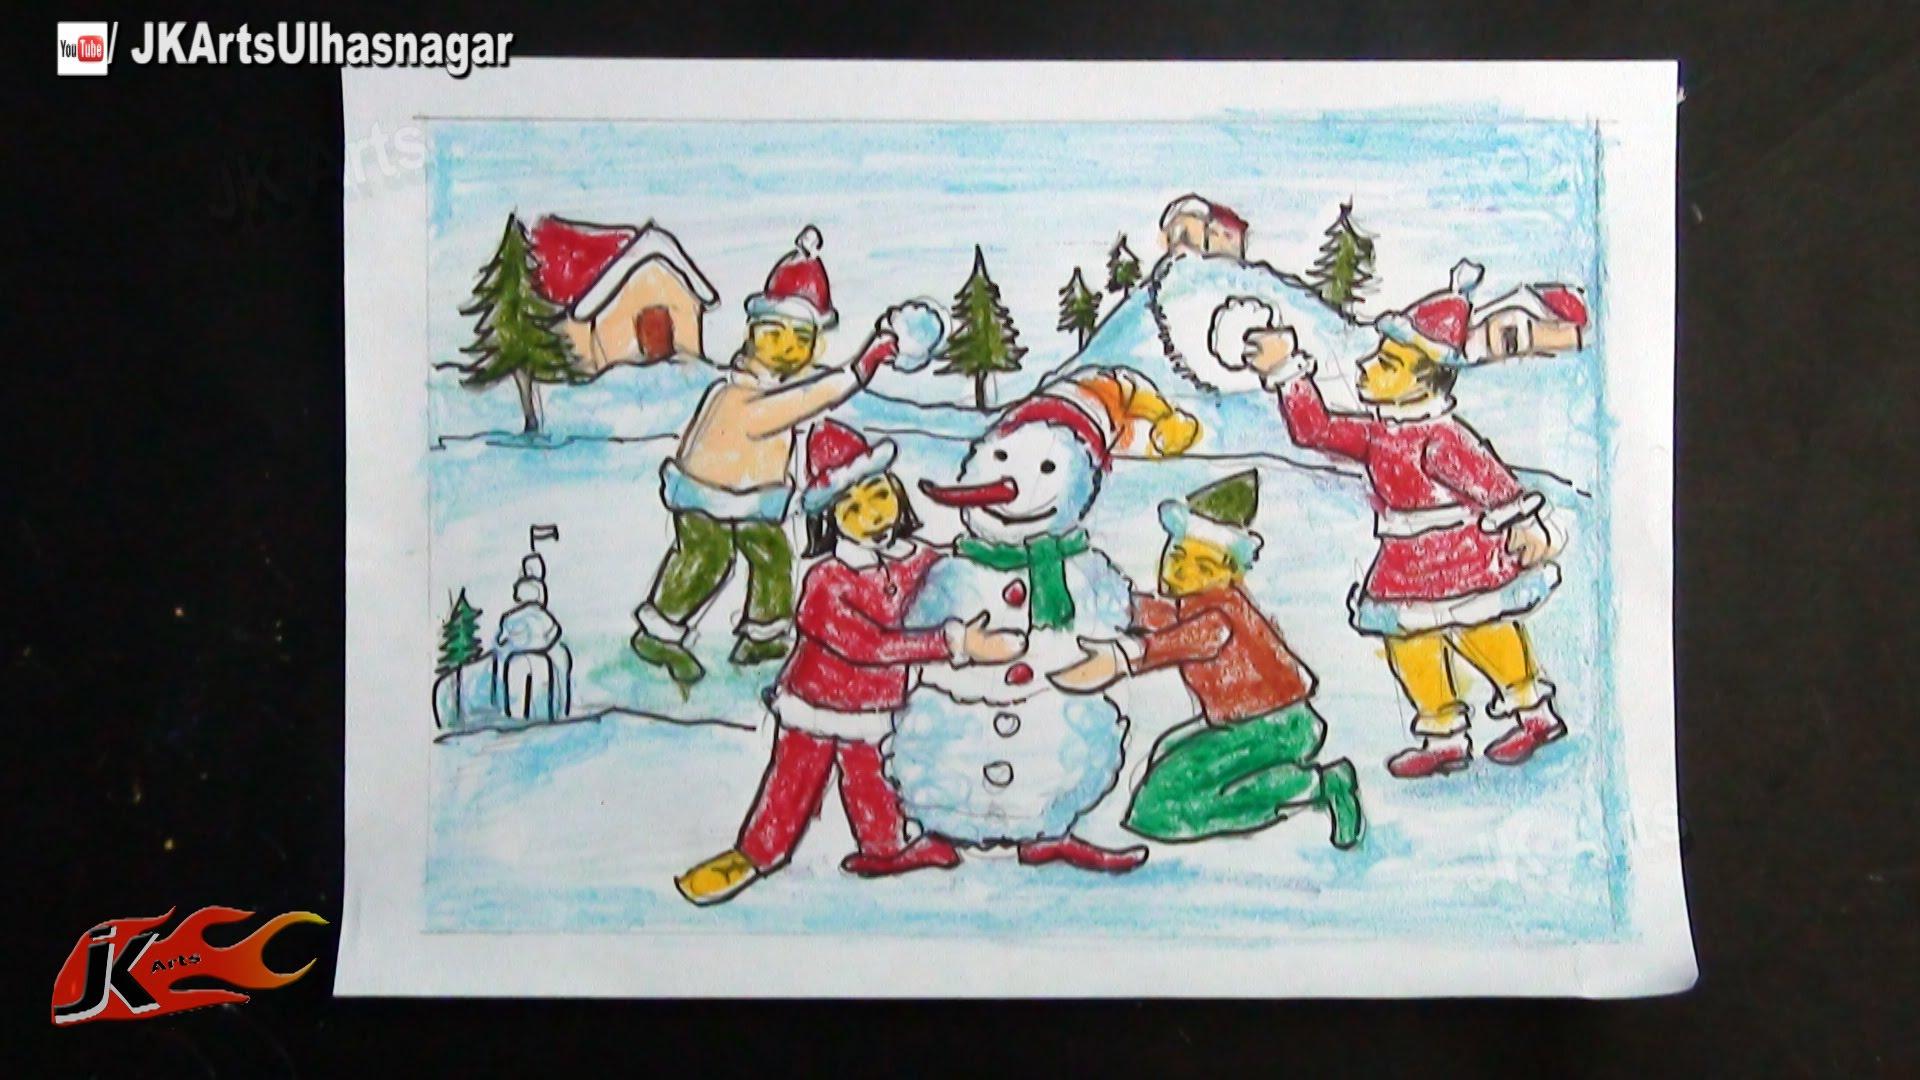 1920x1080 DIY Easy Christmas Drawings How To Draw JK Arts 752